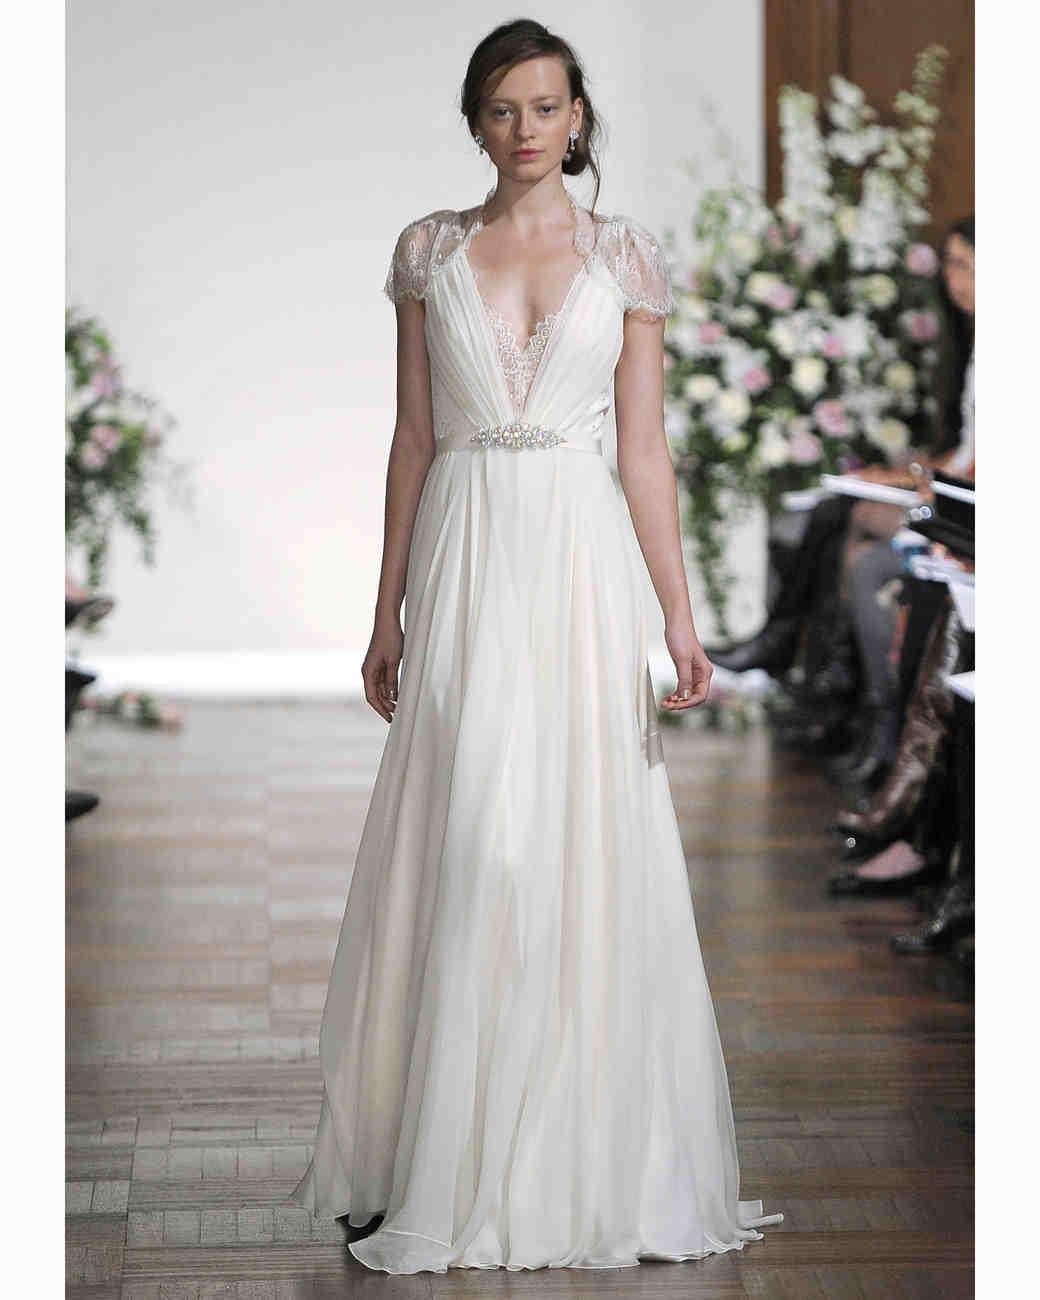 Jenny packham fall 2013 collection martha stewart weddings for Vera wang robes de mariage d hiver